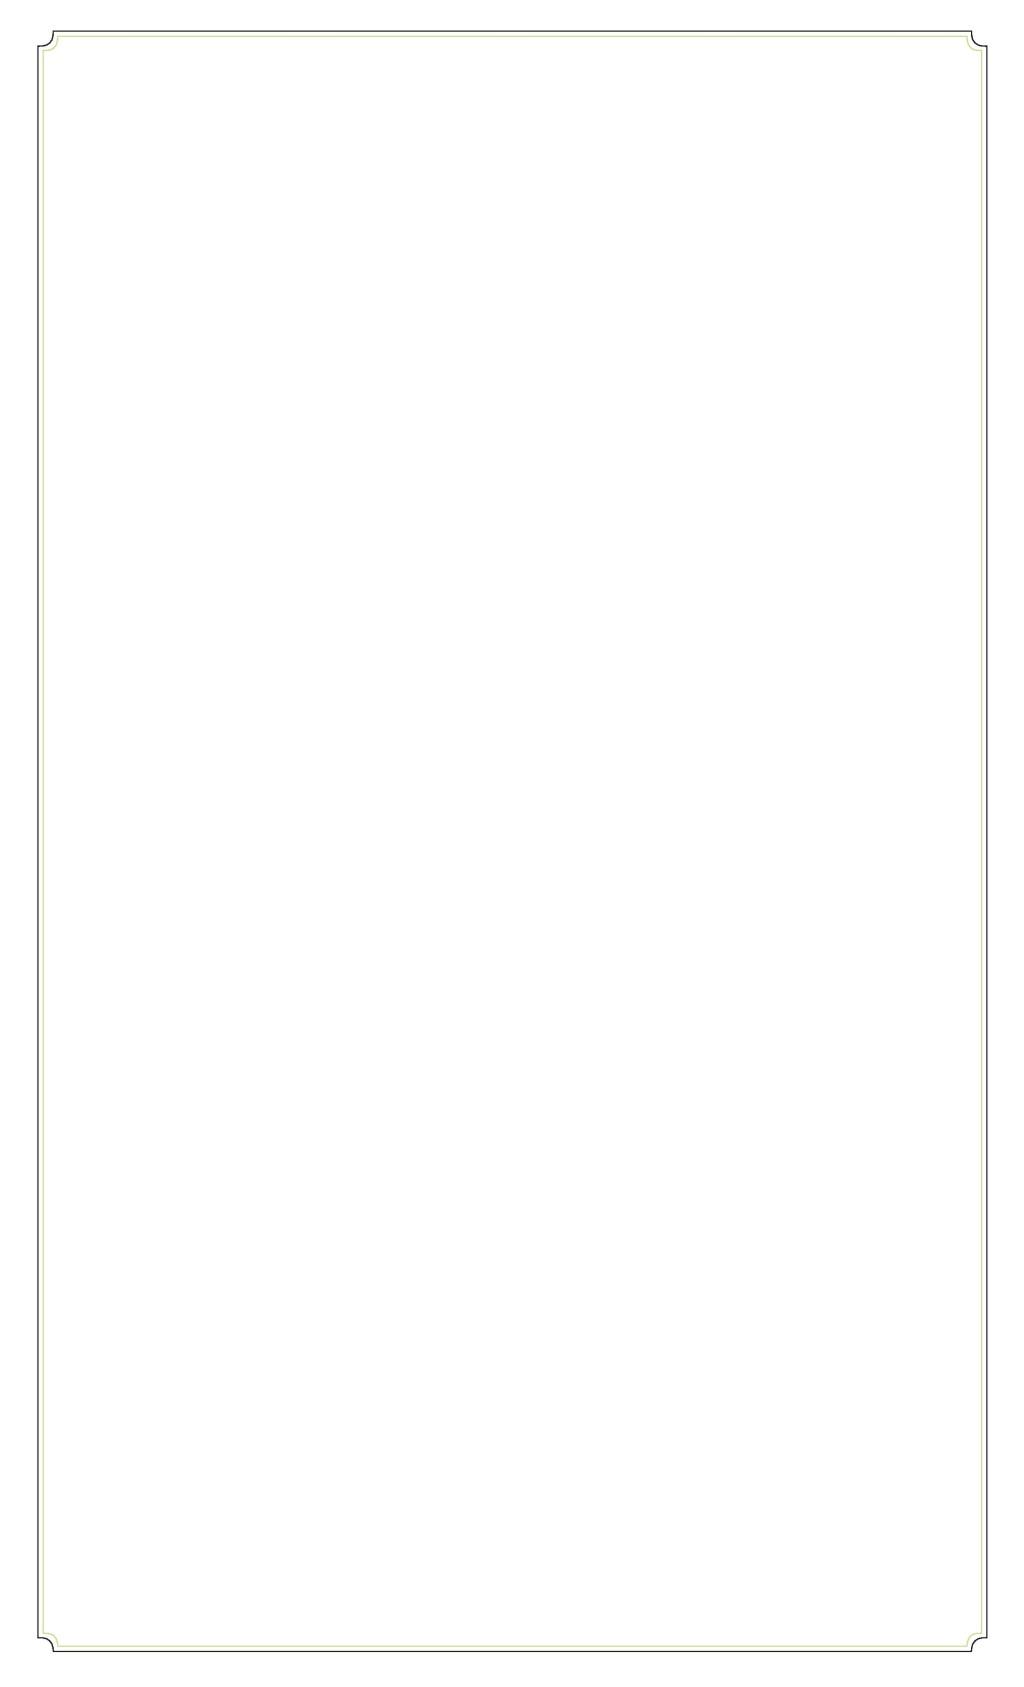 menu outline page 001 queenstown public house